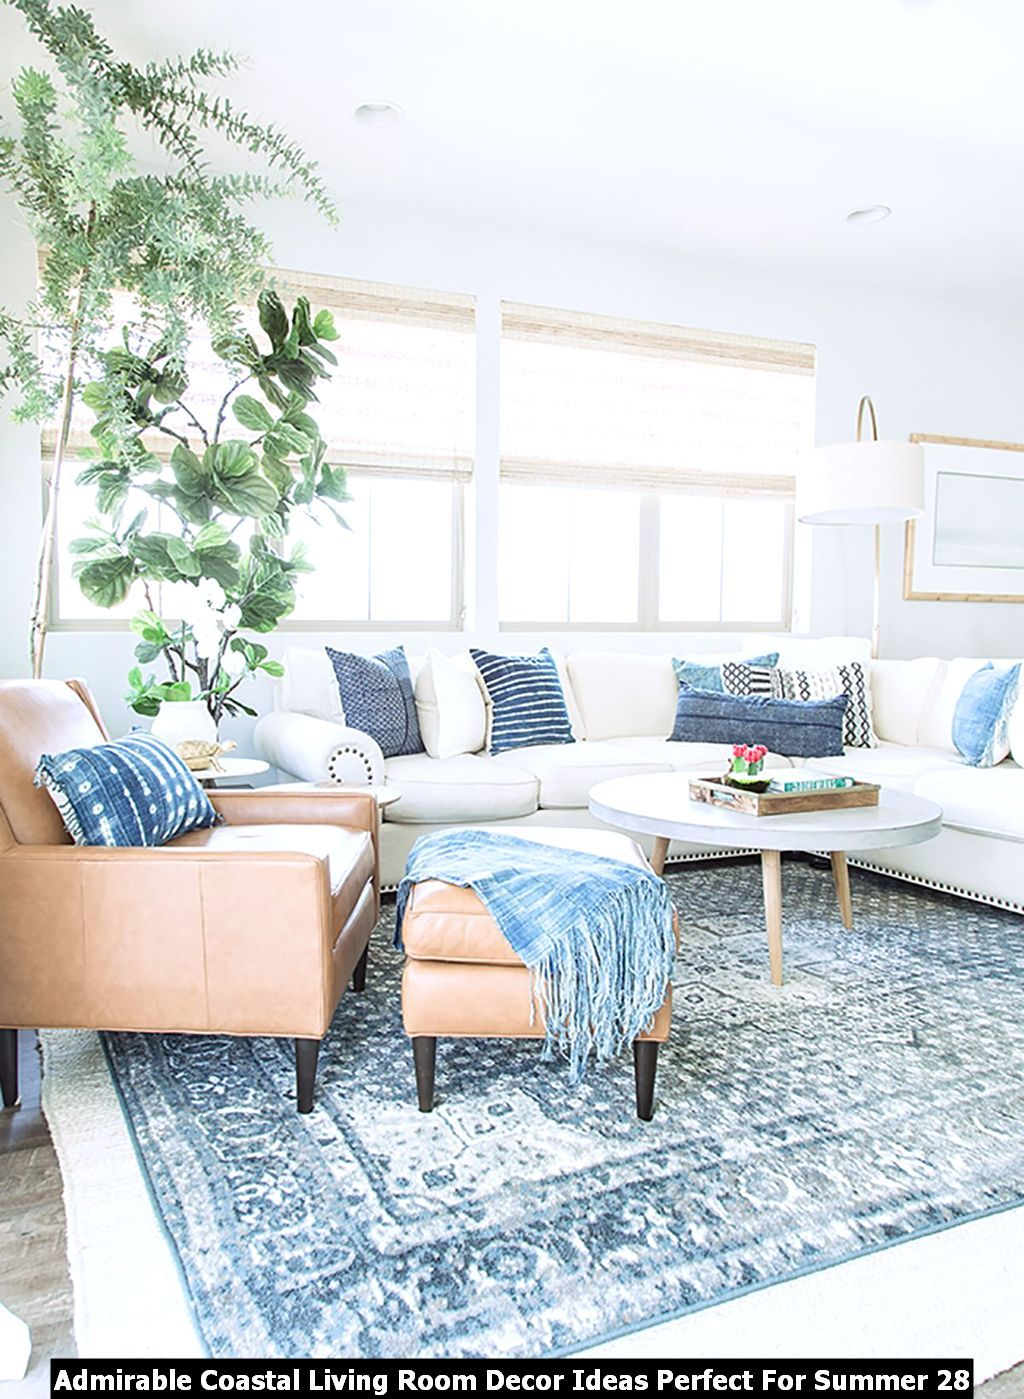 Admirable Coastal Living Room Decor Ideas Perfect For Summer Pimphomee Farmhouse Decor Living Room Living Room Decor Apartment Coastal Decorating Living Room